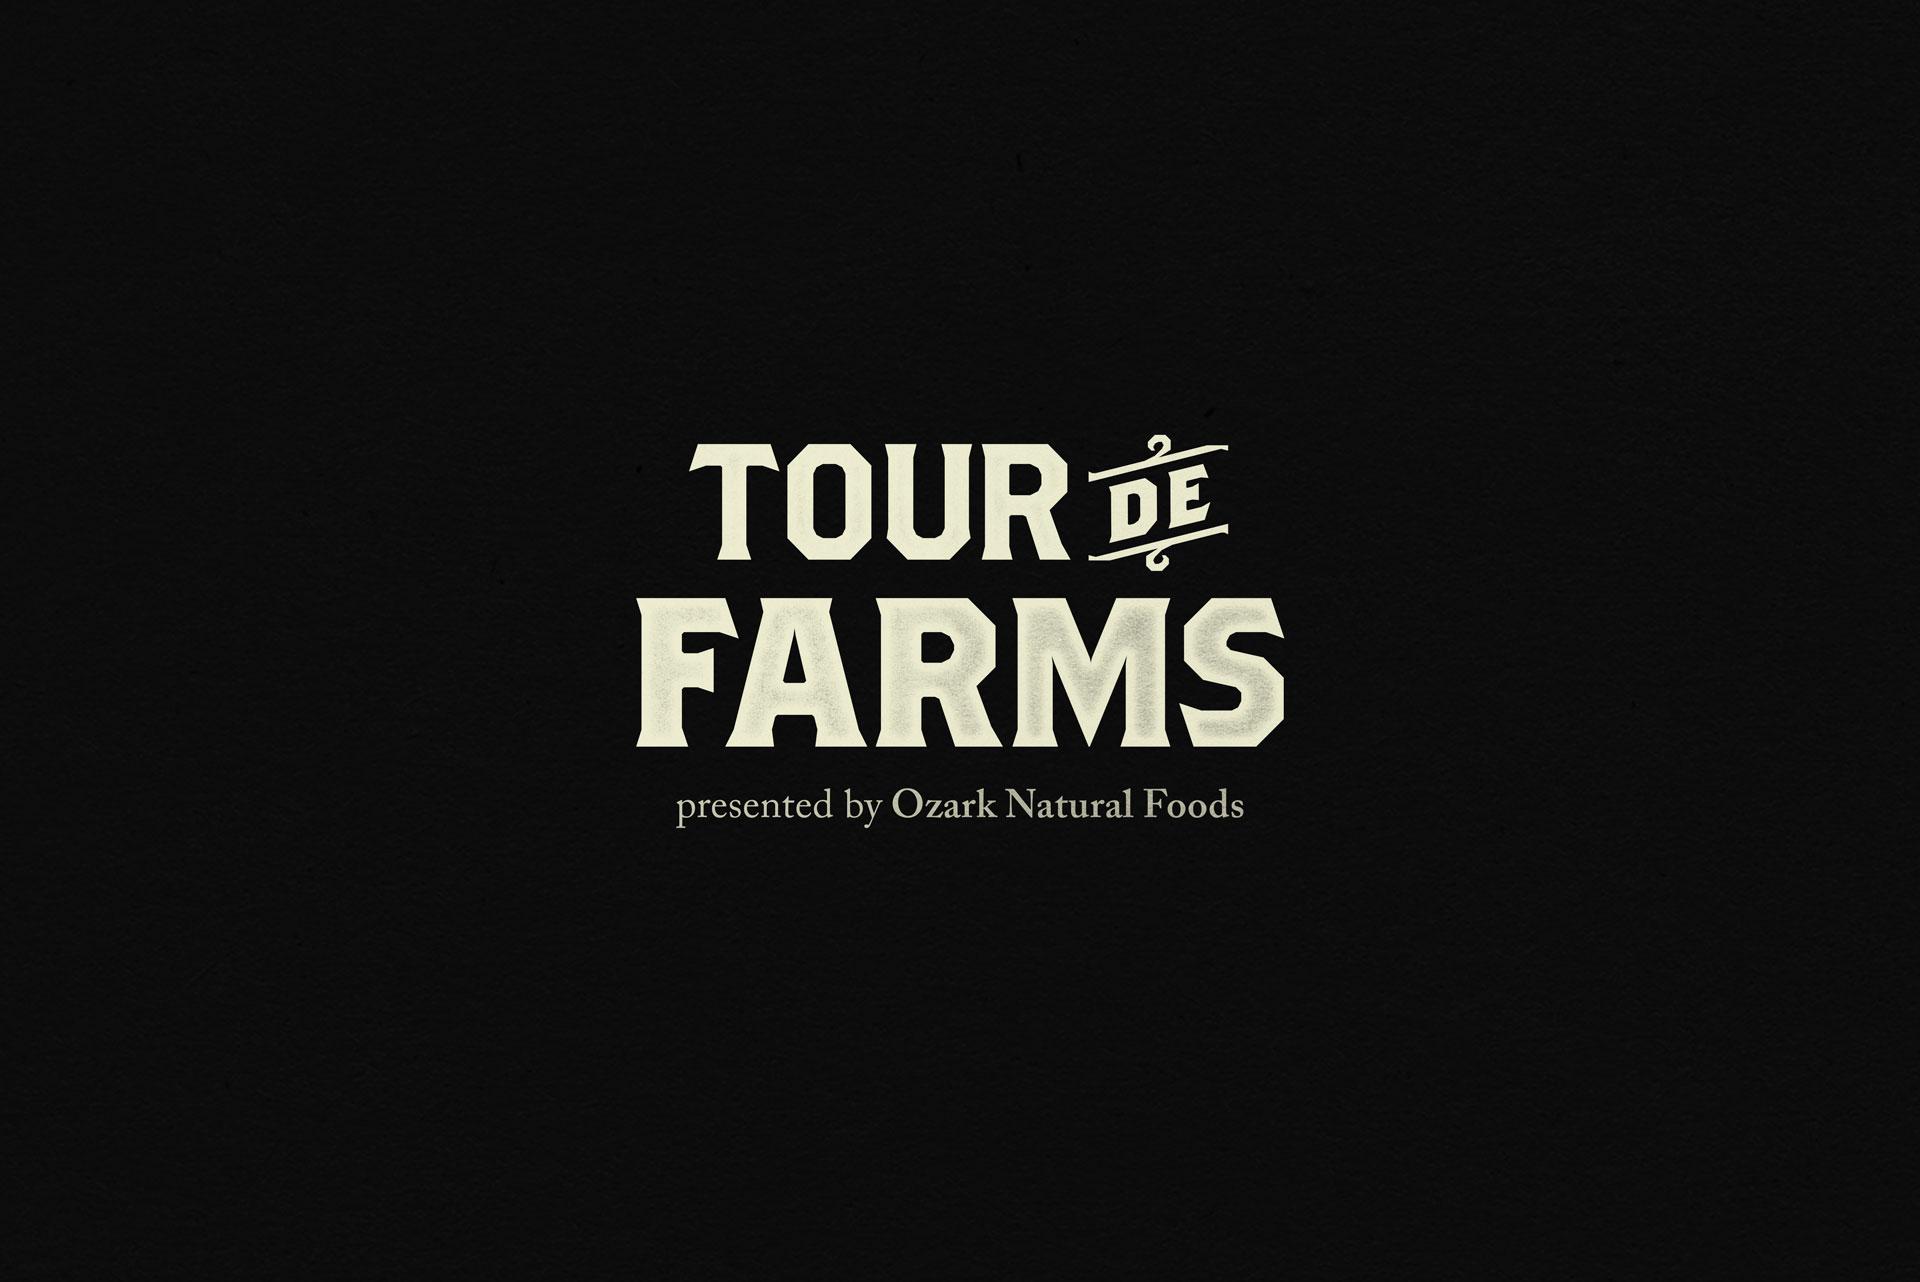 Tour_De_Farms_TriCycle_Final_Mockup_2.jpg